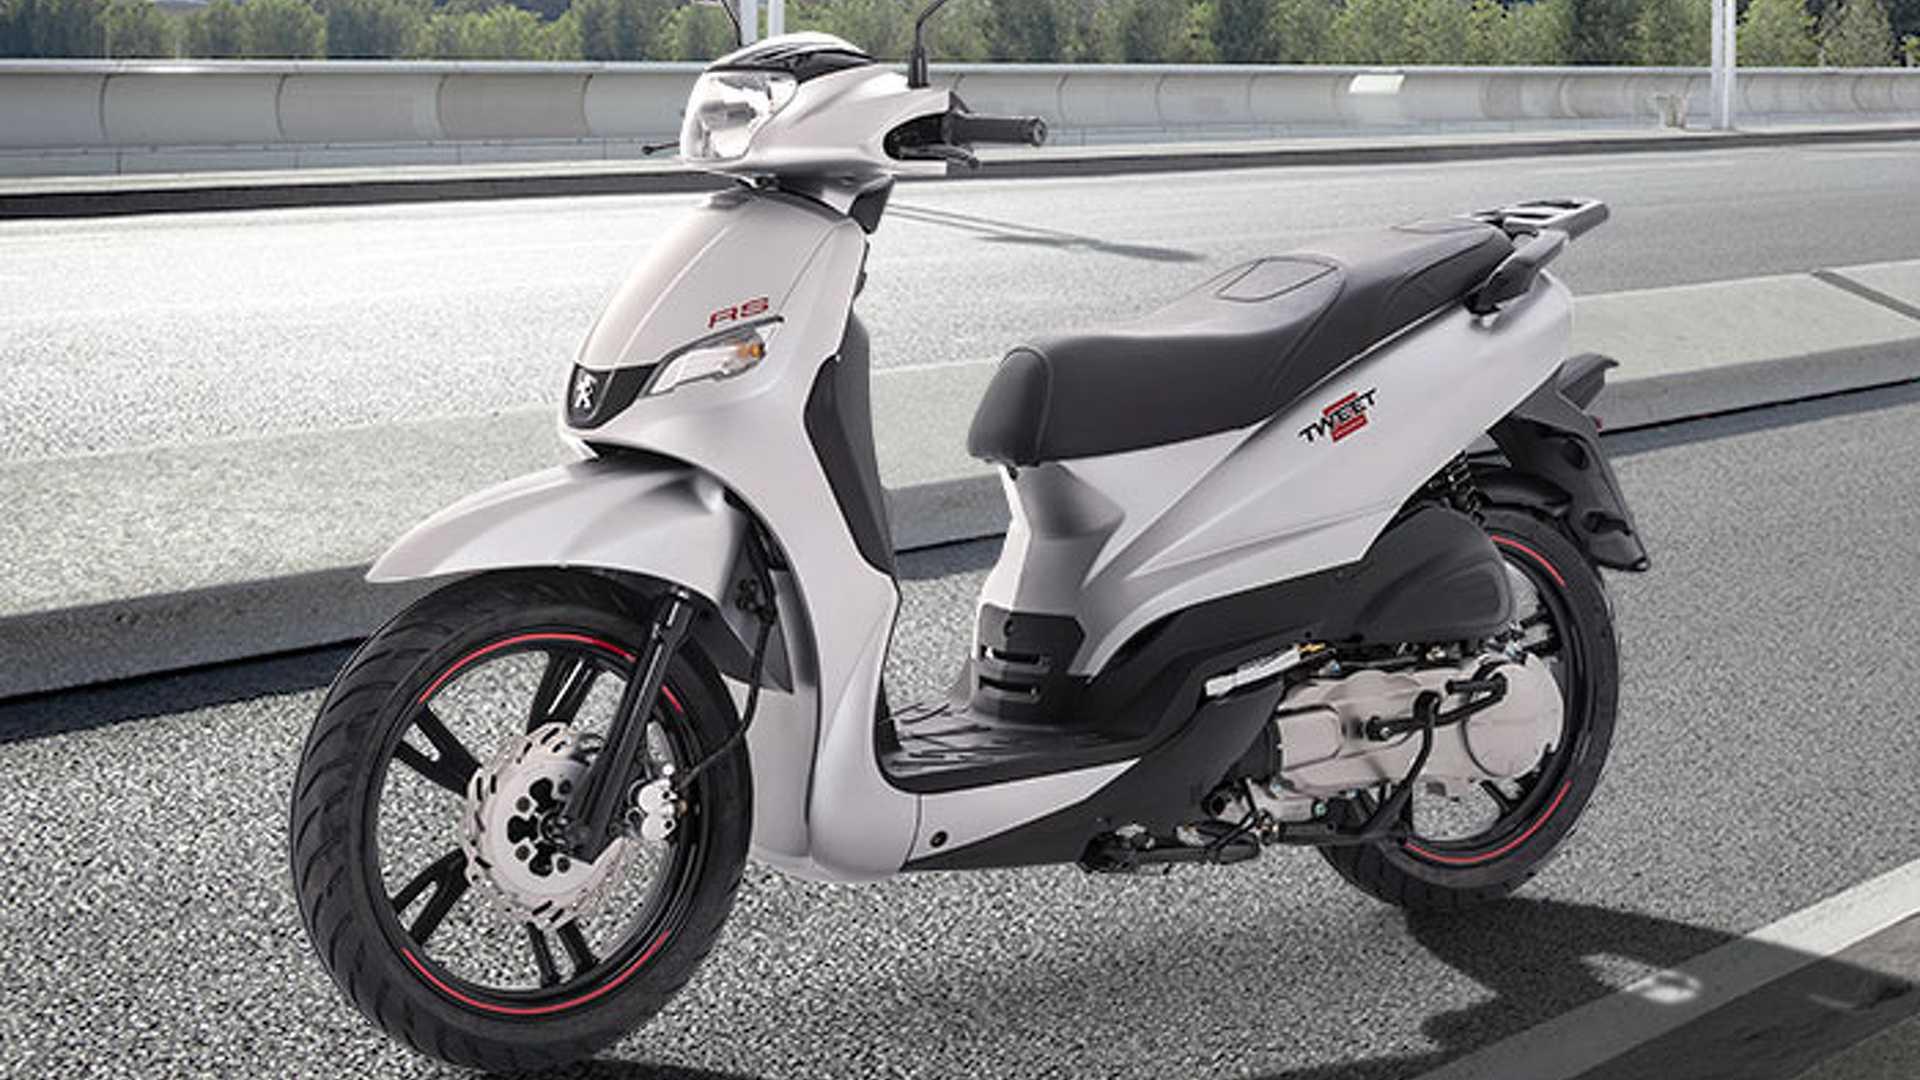 Peugeot Scooters 125 Cm3 Tweet Y Django Motor1 Com Fotos